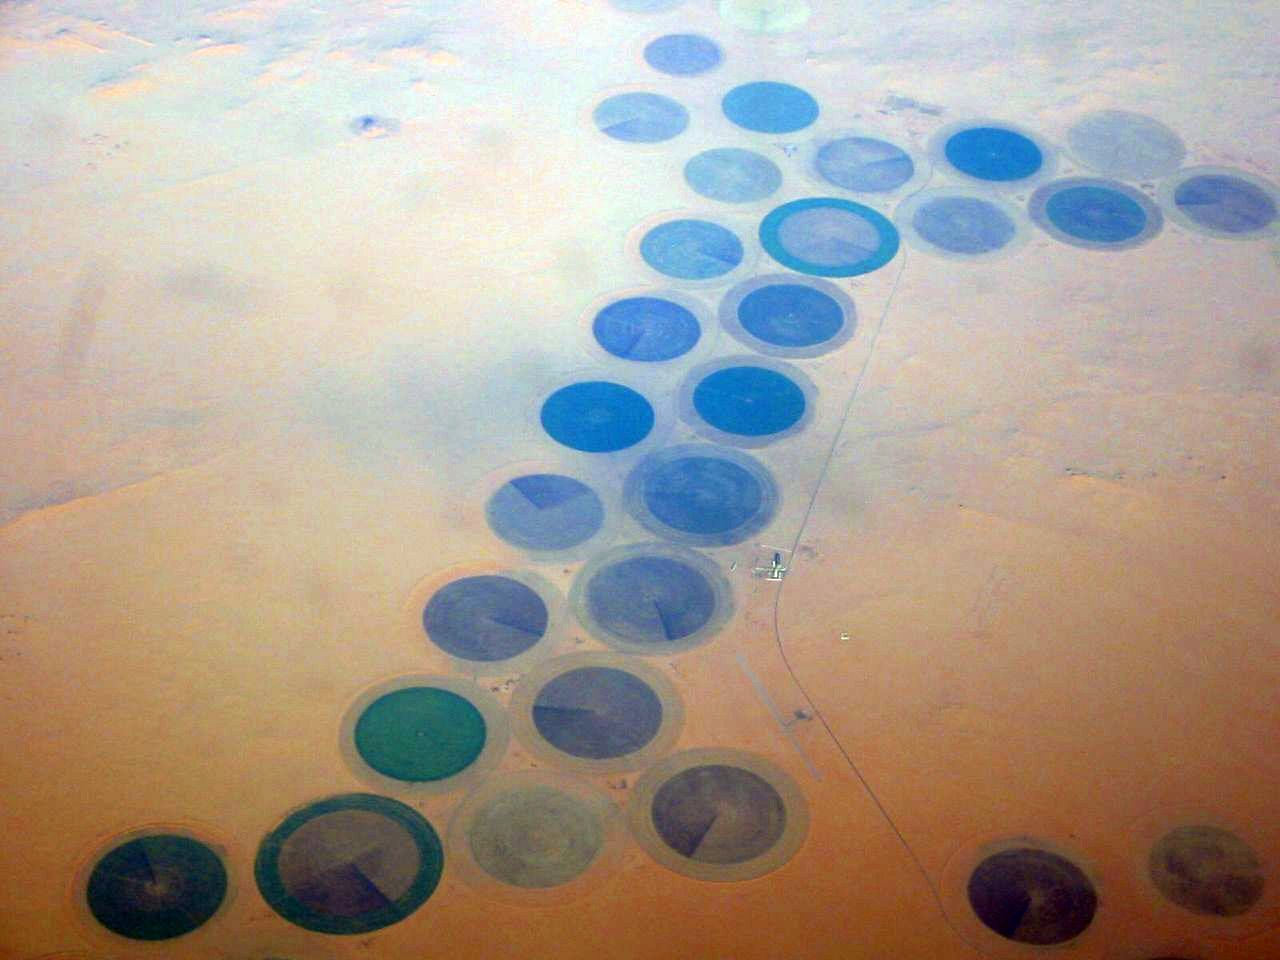 Exploitations agricoles dans le Sahara